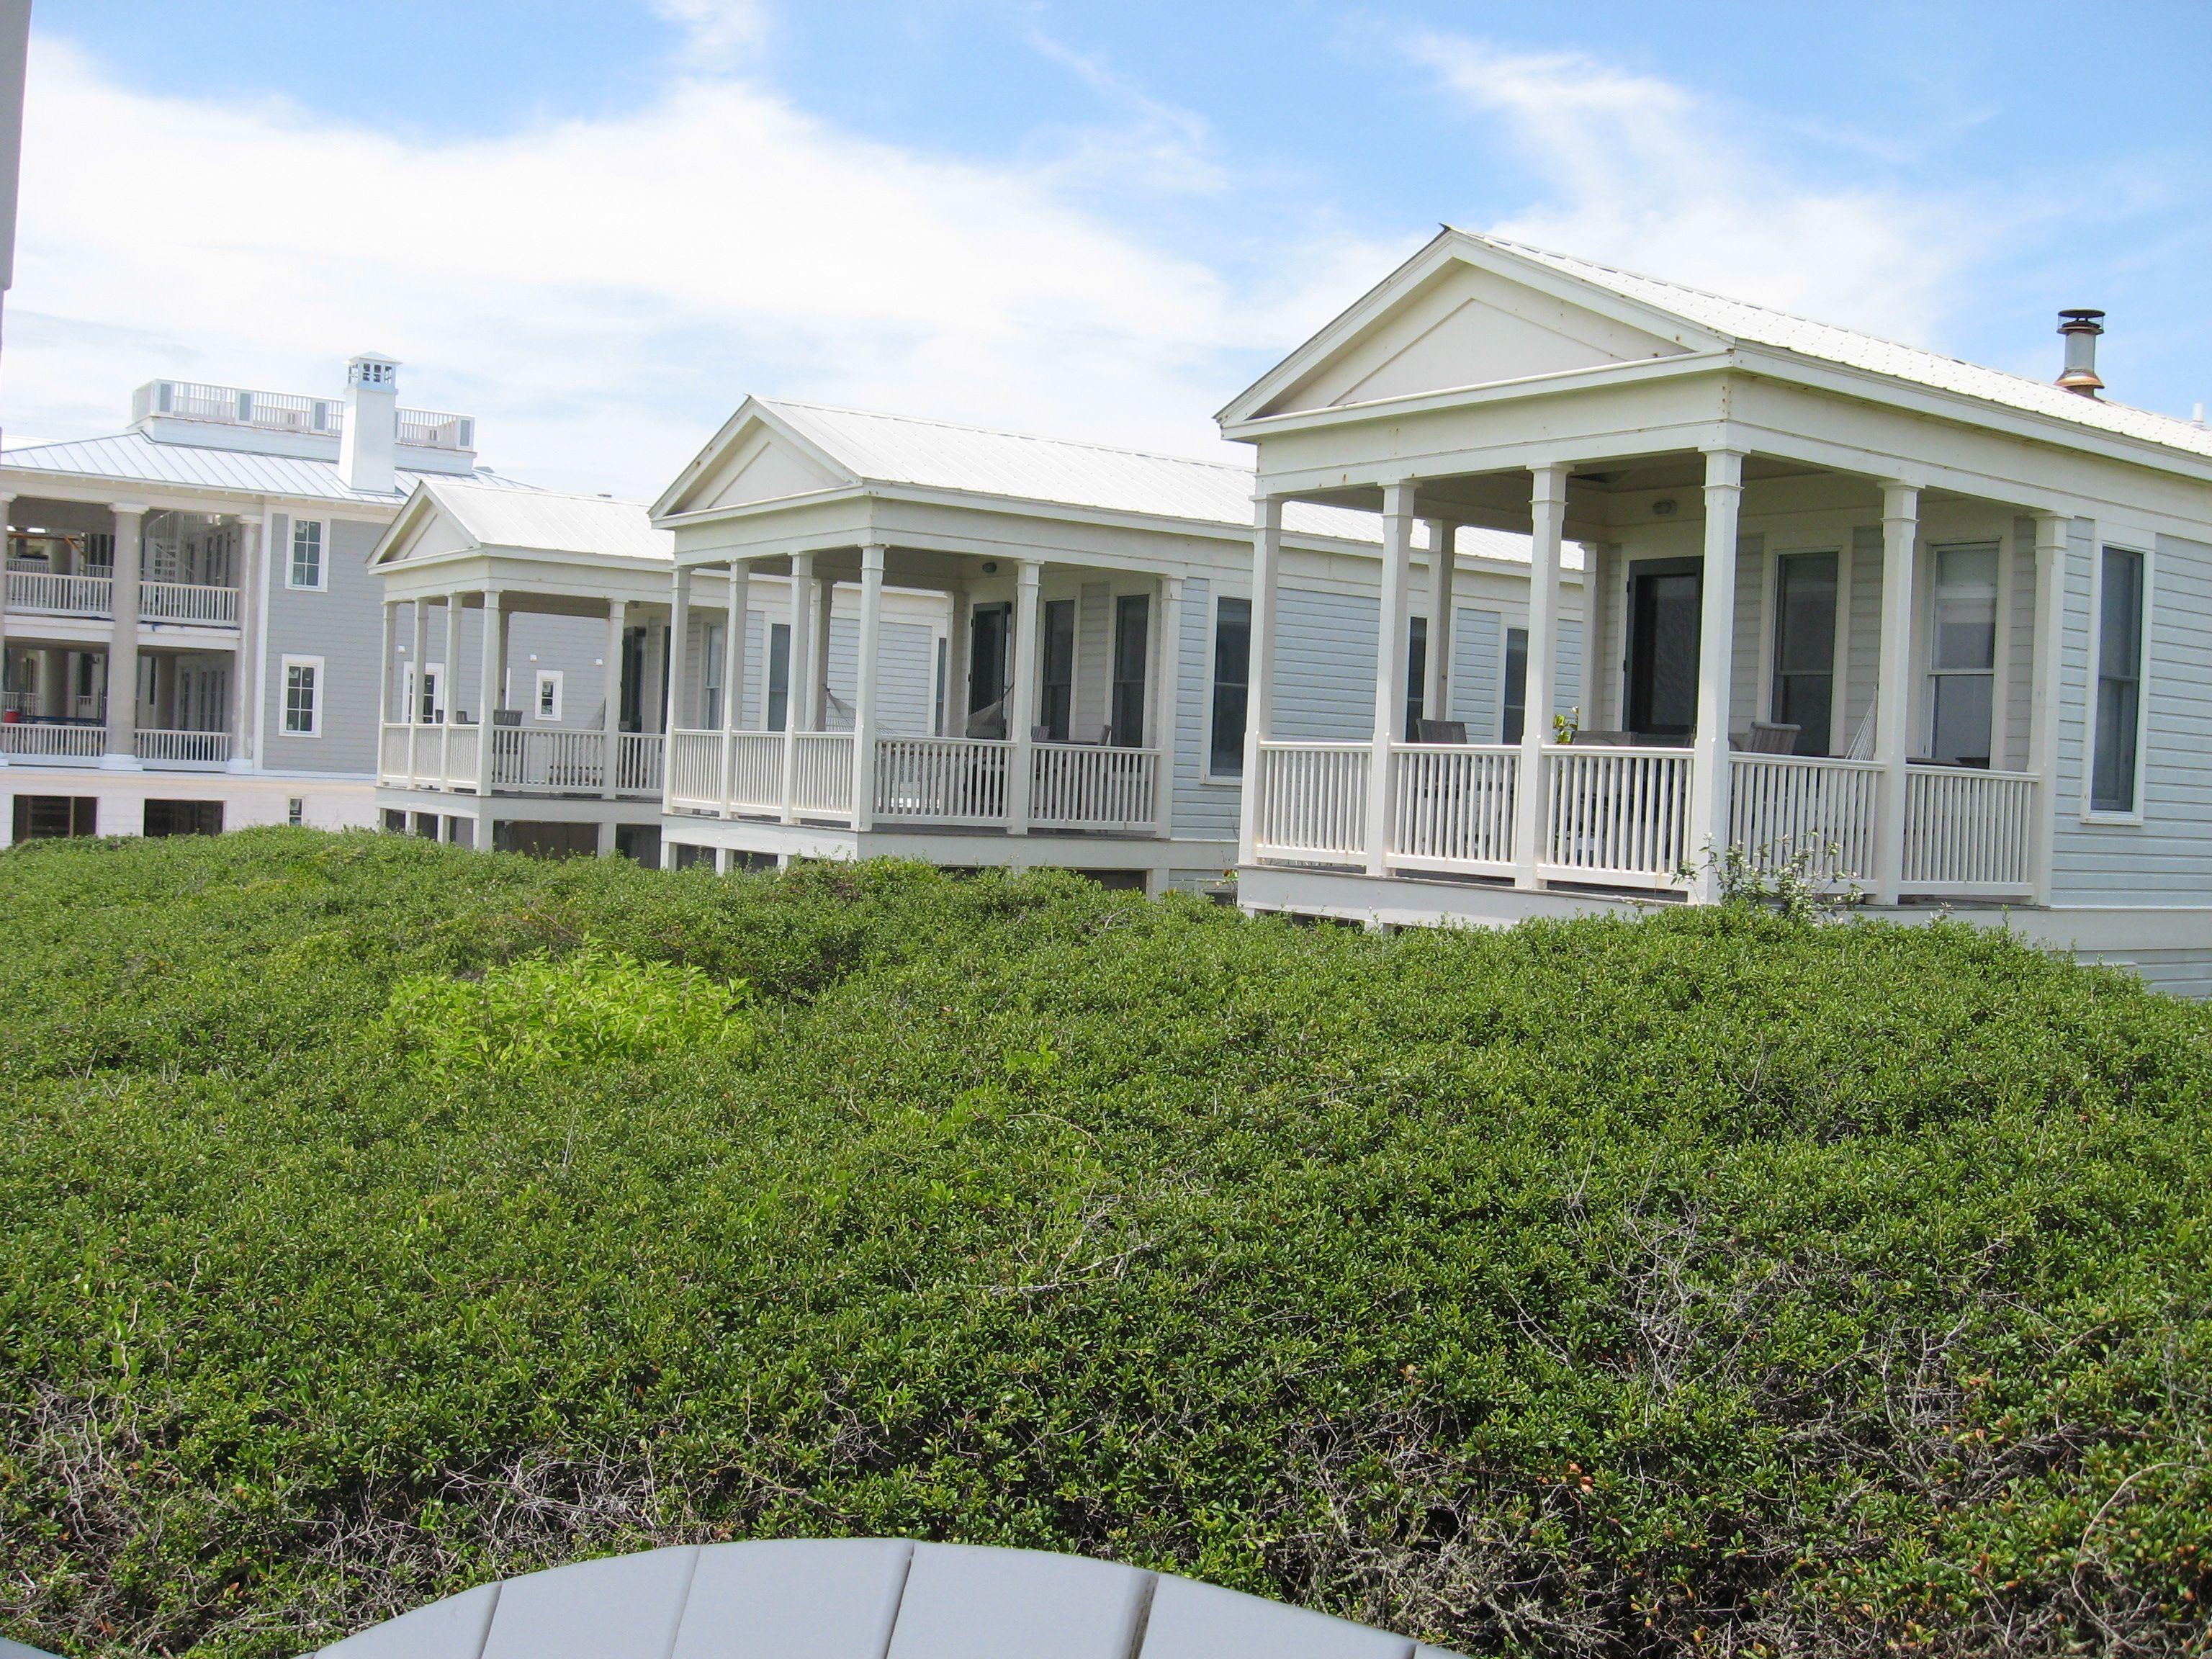 honeymoon cottages seaside fl seaside florida pinterest rh pinterest com seaside honeymoon cottages for rent seaside fl honeymoon cottages